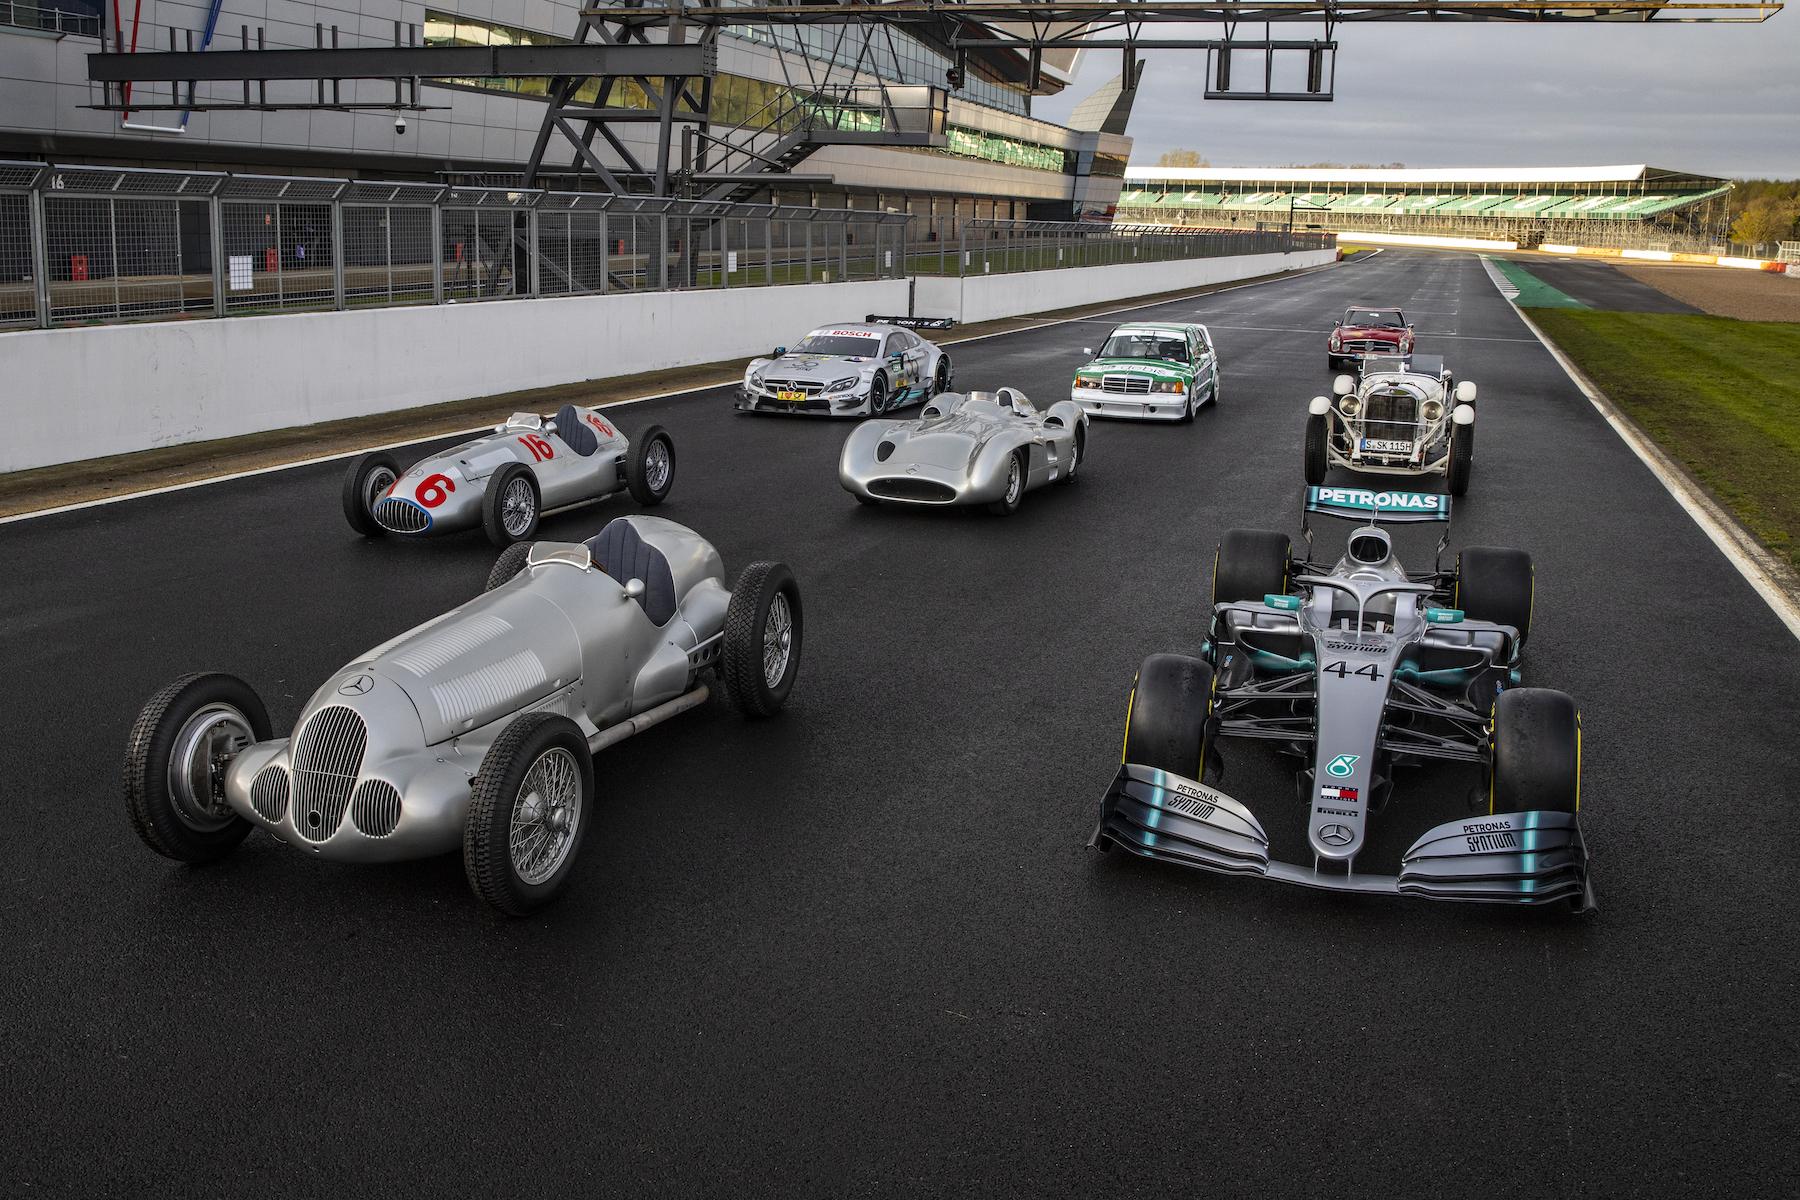 2019 Mercedes 125 years in Motorsports celebration | 2019 Silverstone 16.jpg